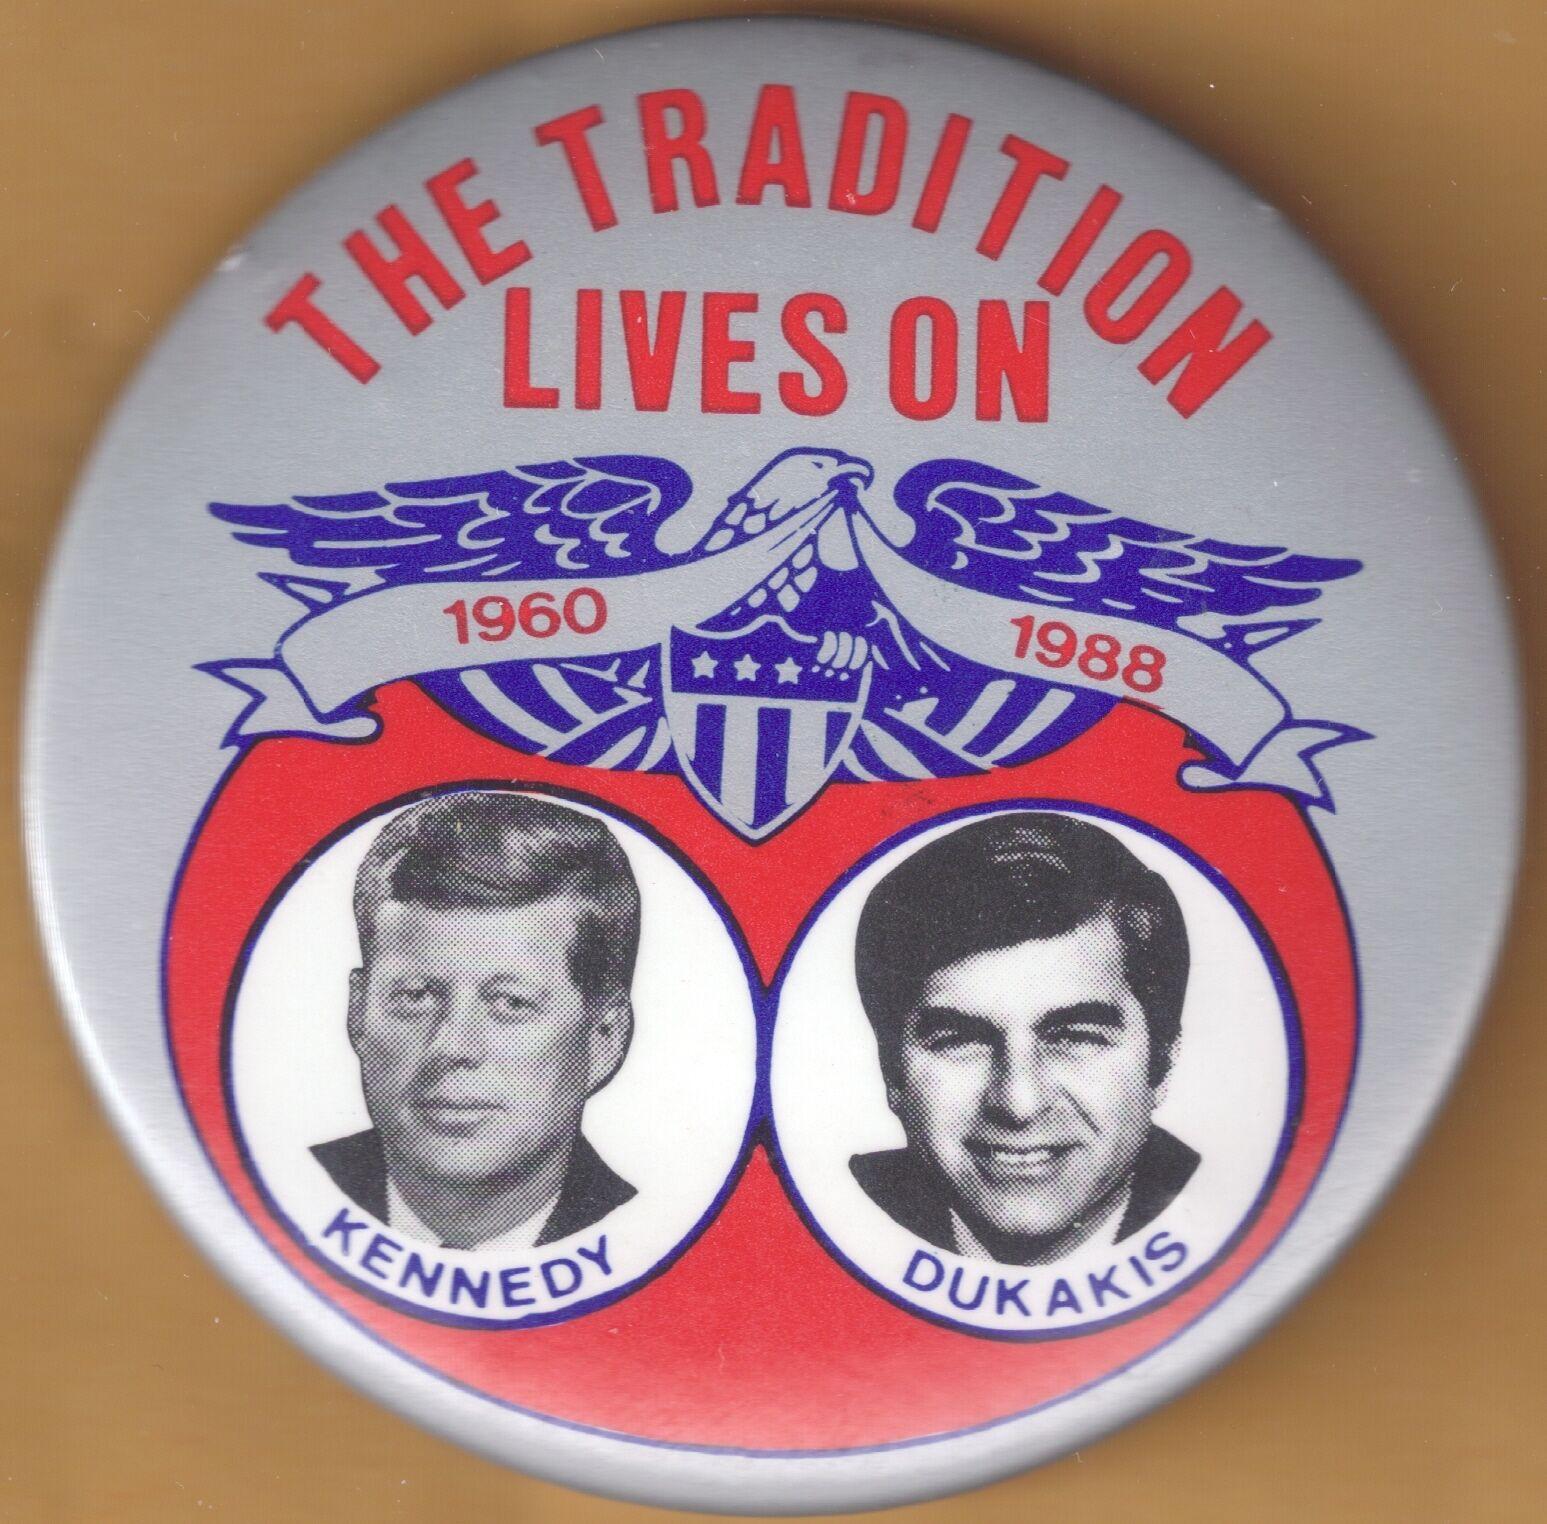 1988 Michael Dukakis for President Effort Button with John F. Kennedy